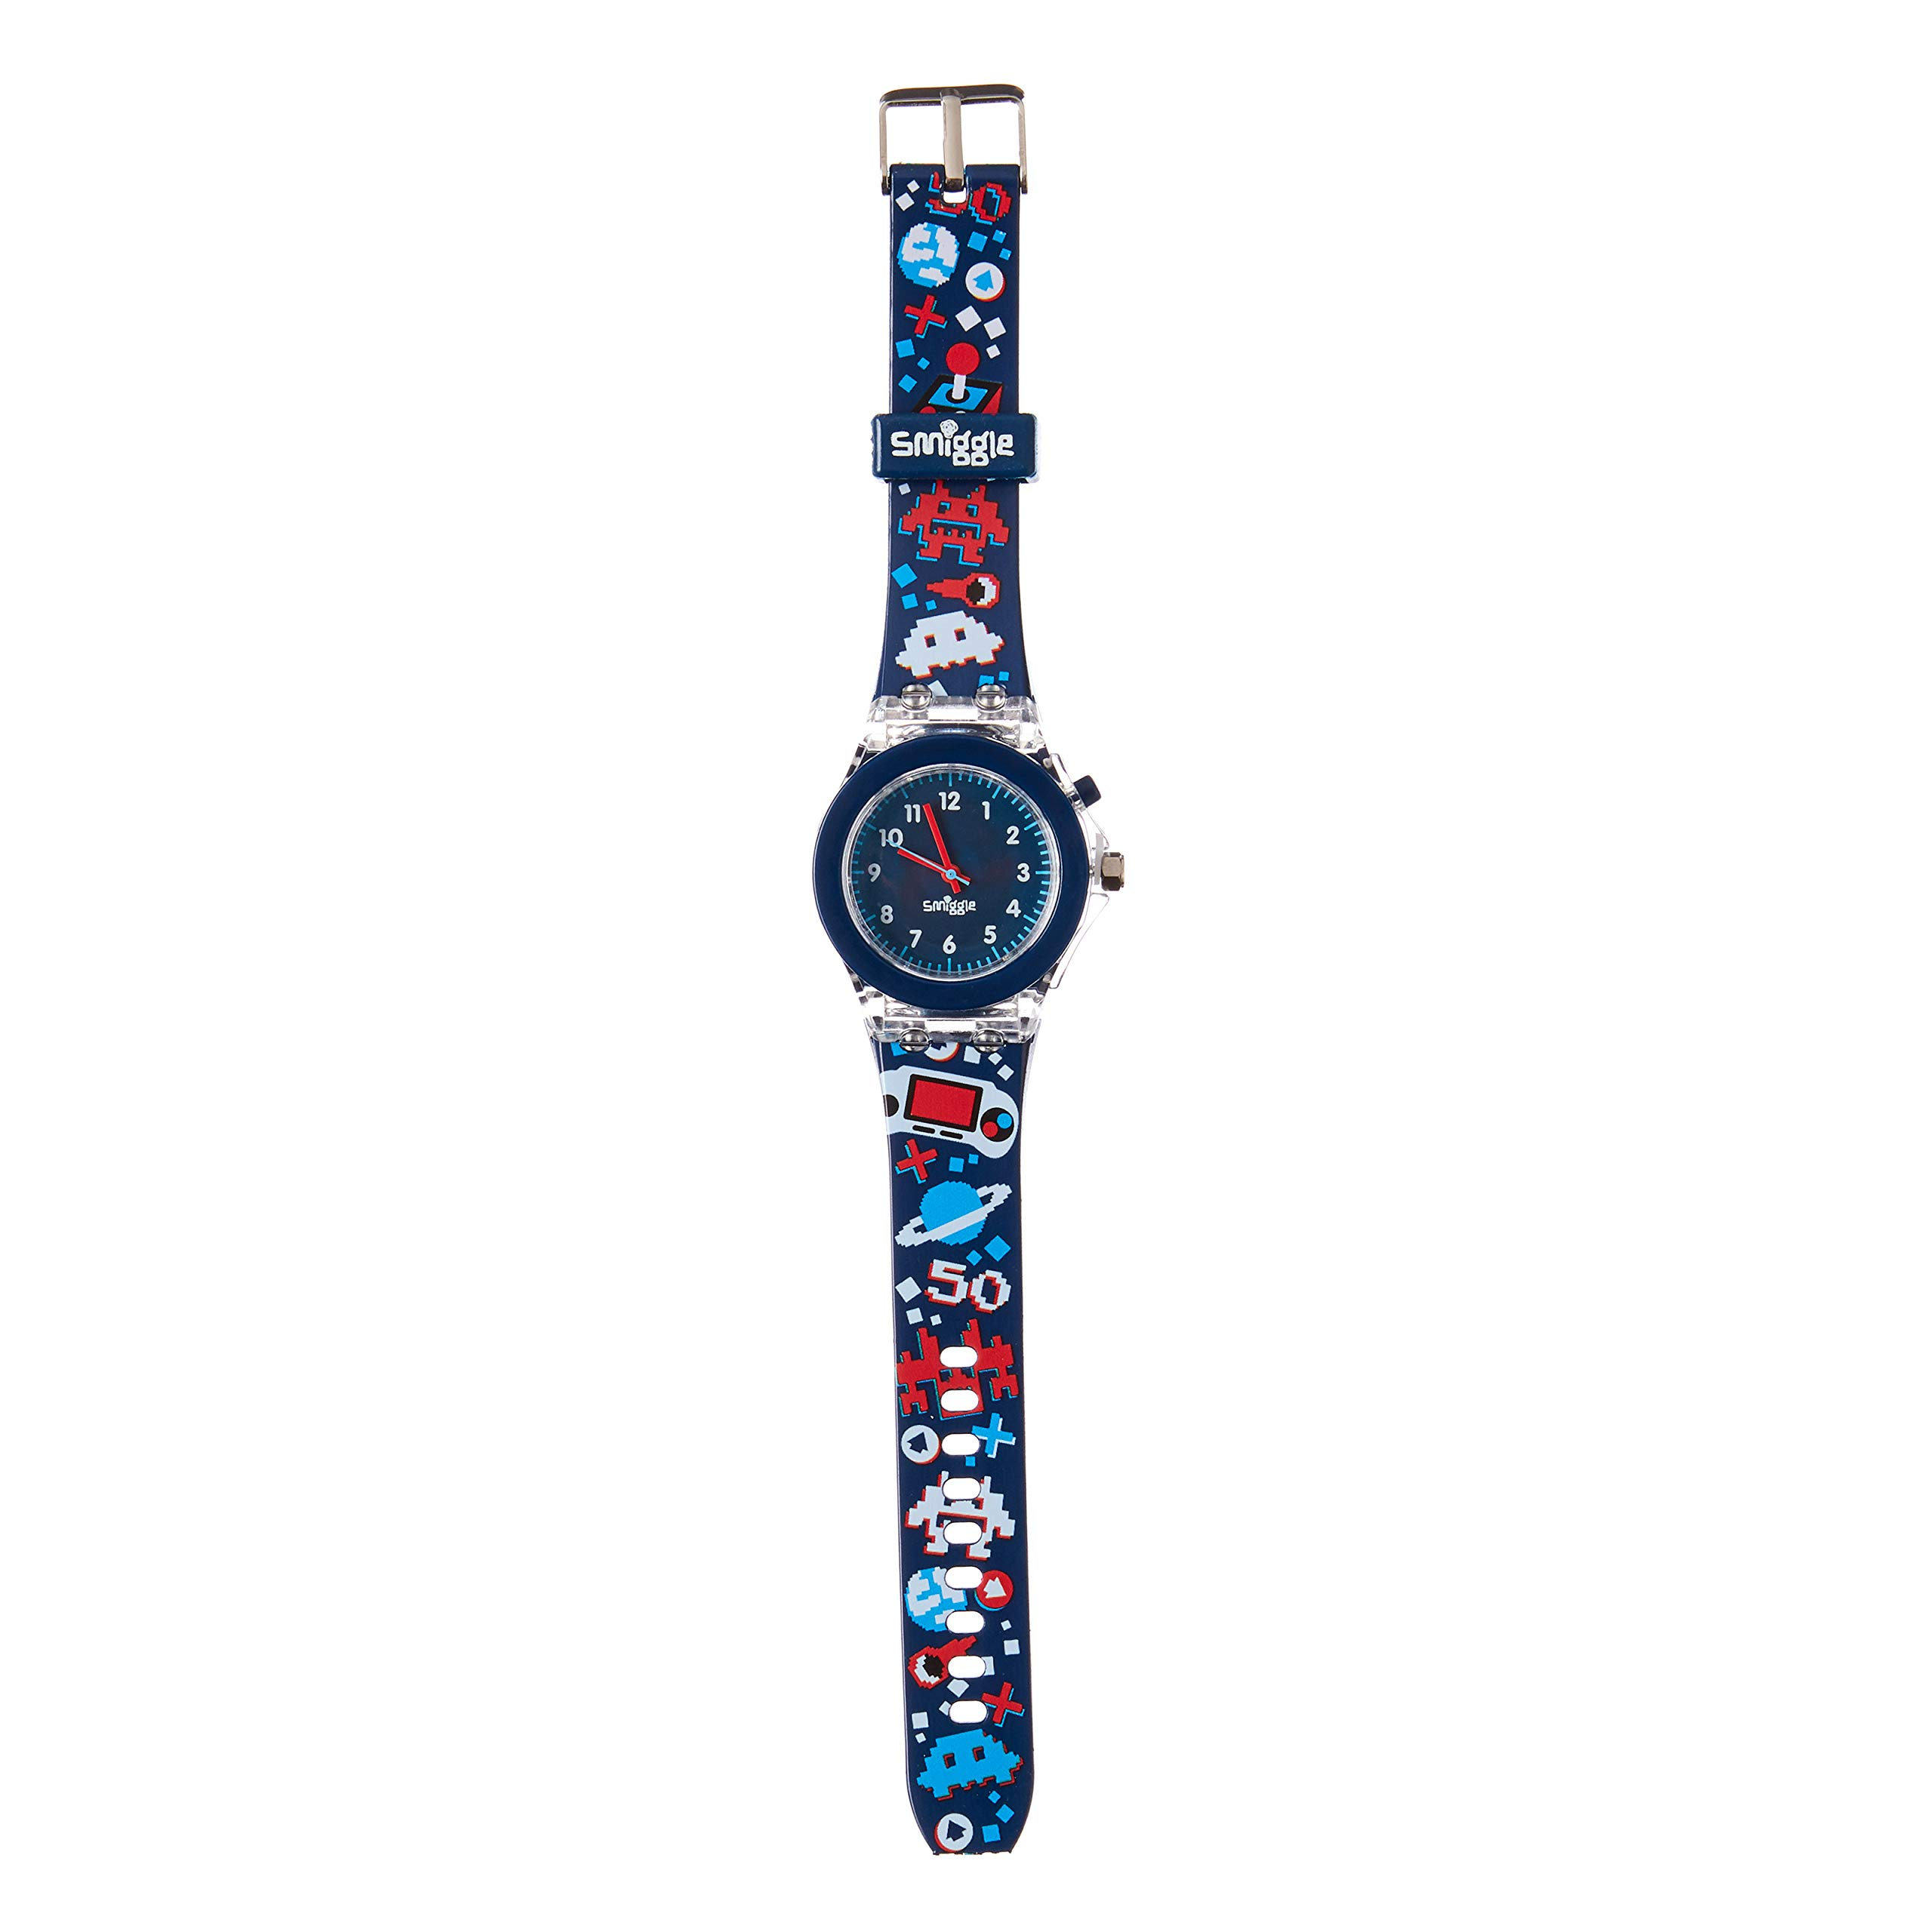 Smiggle Mash Light Time Watch - Navy